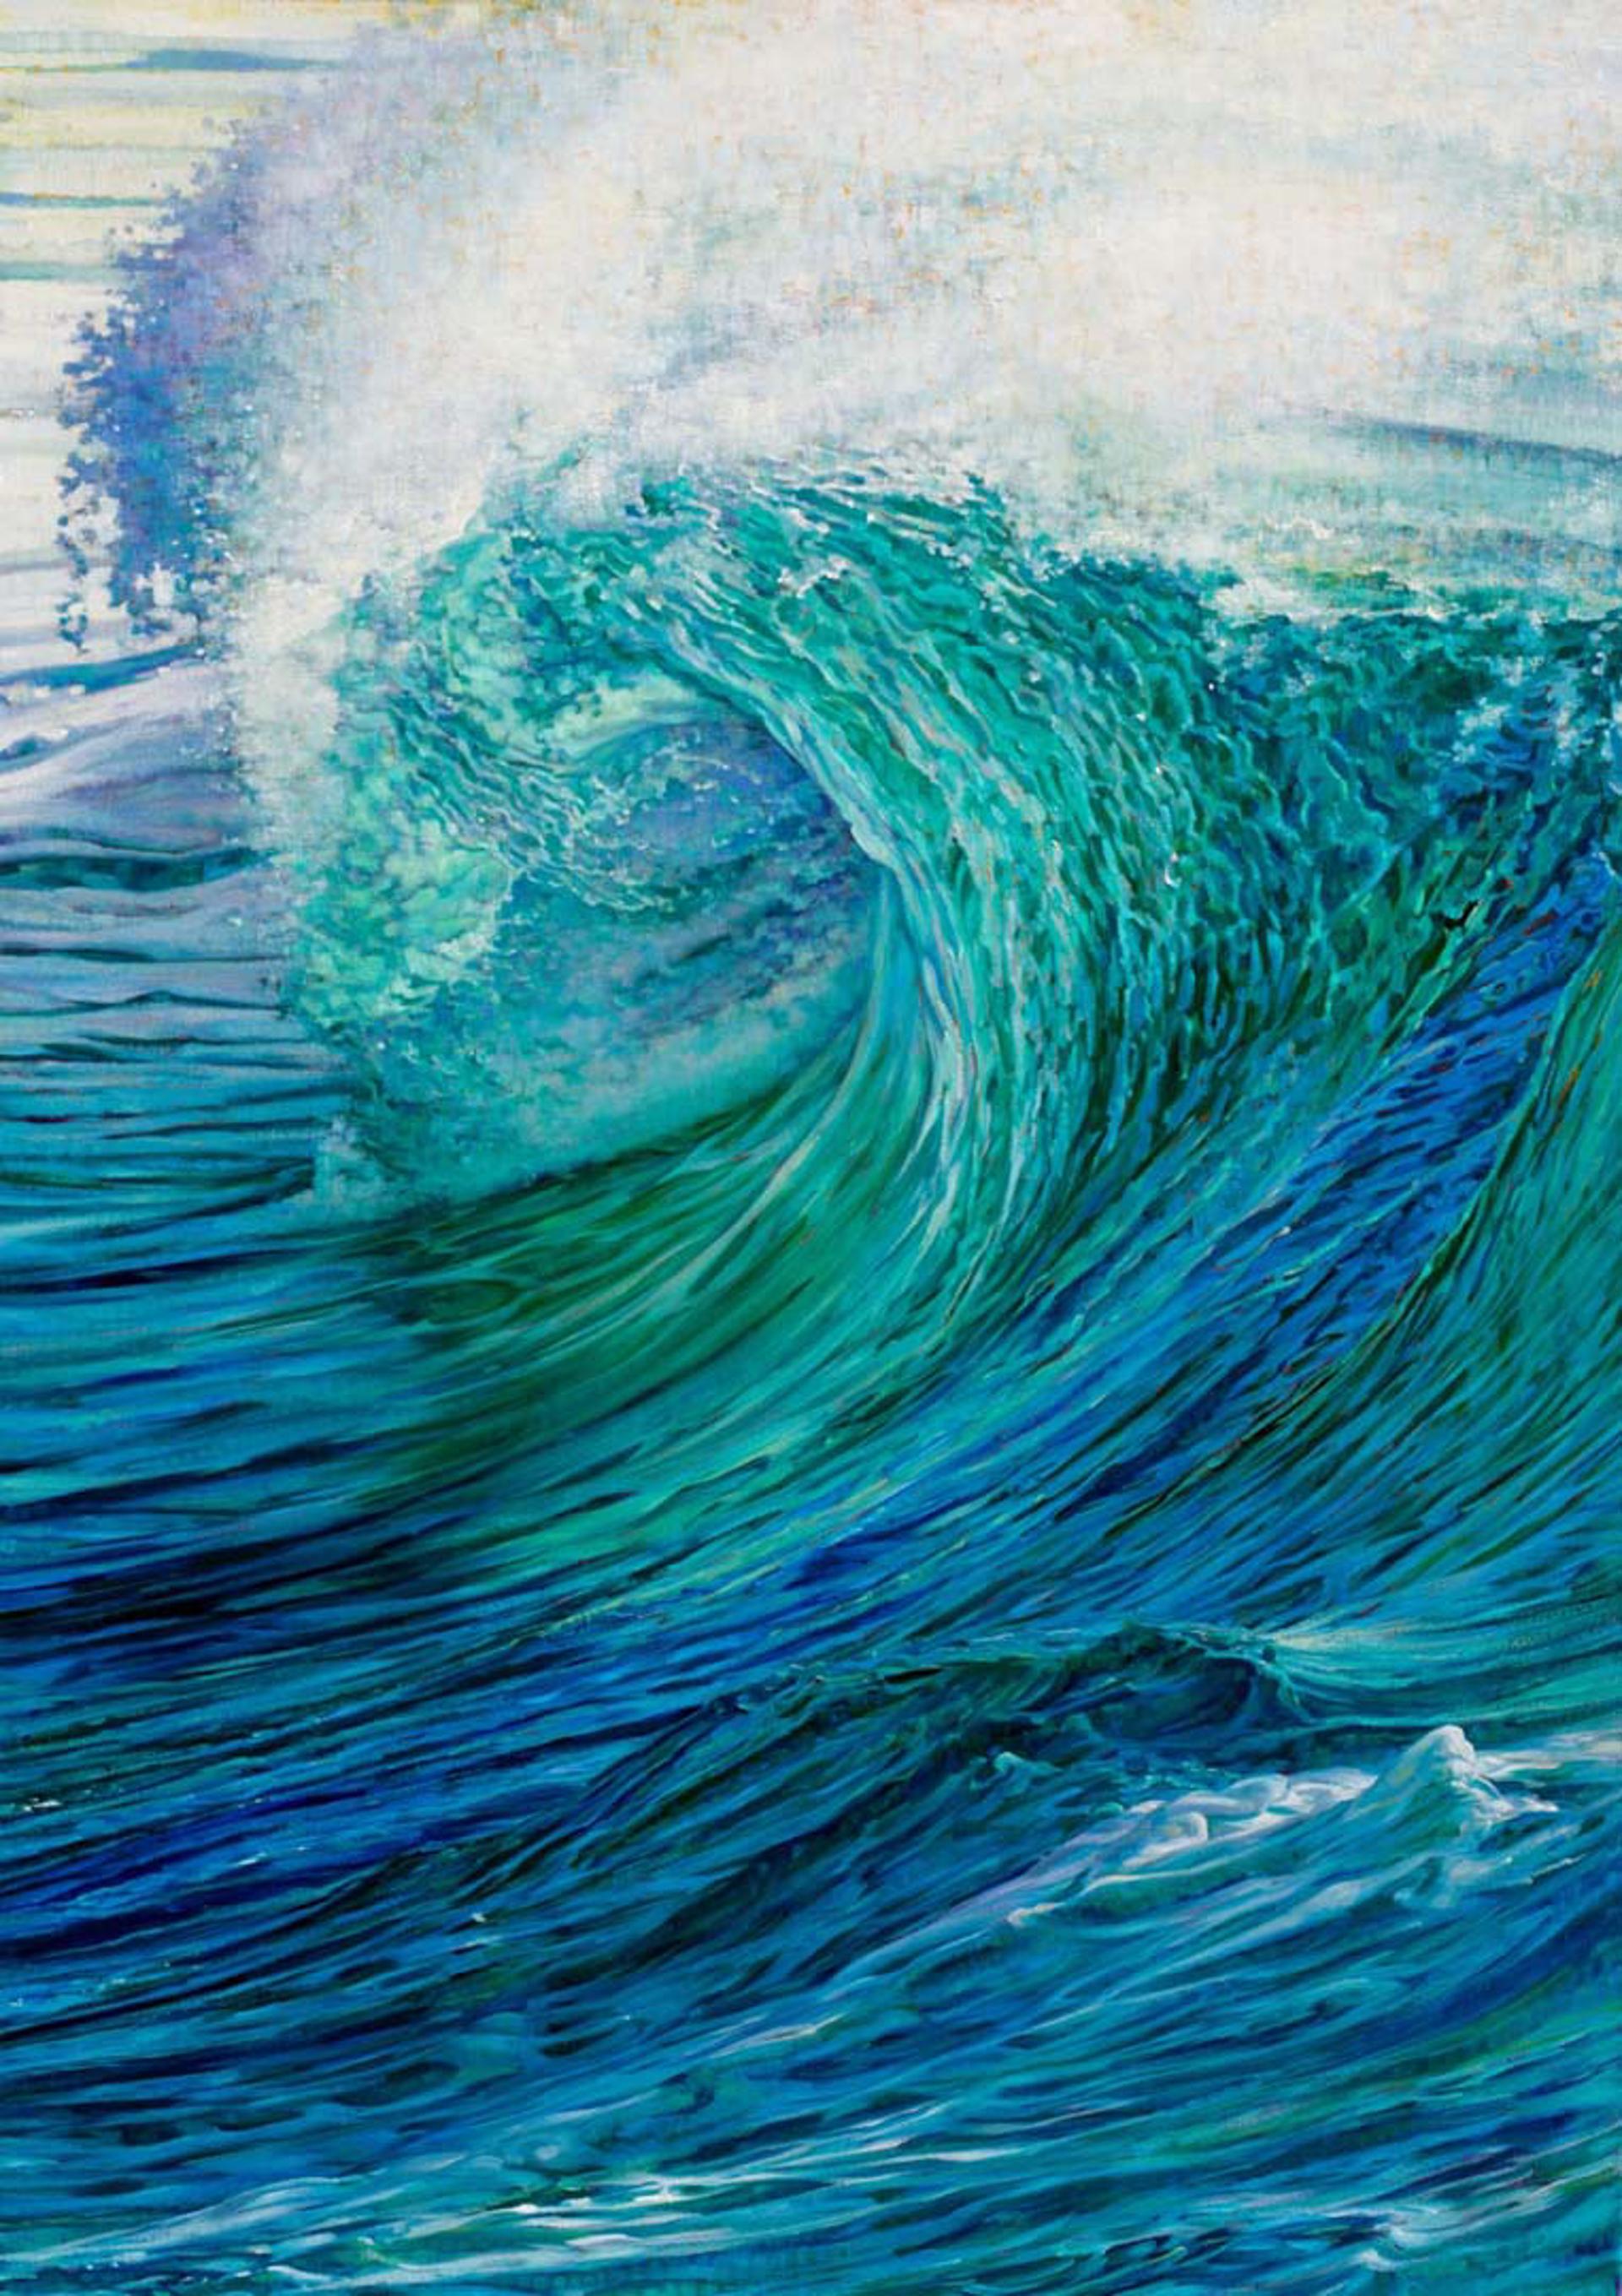 The Next Wave by Caroline Zimmermann